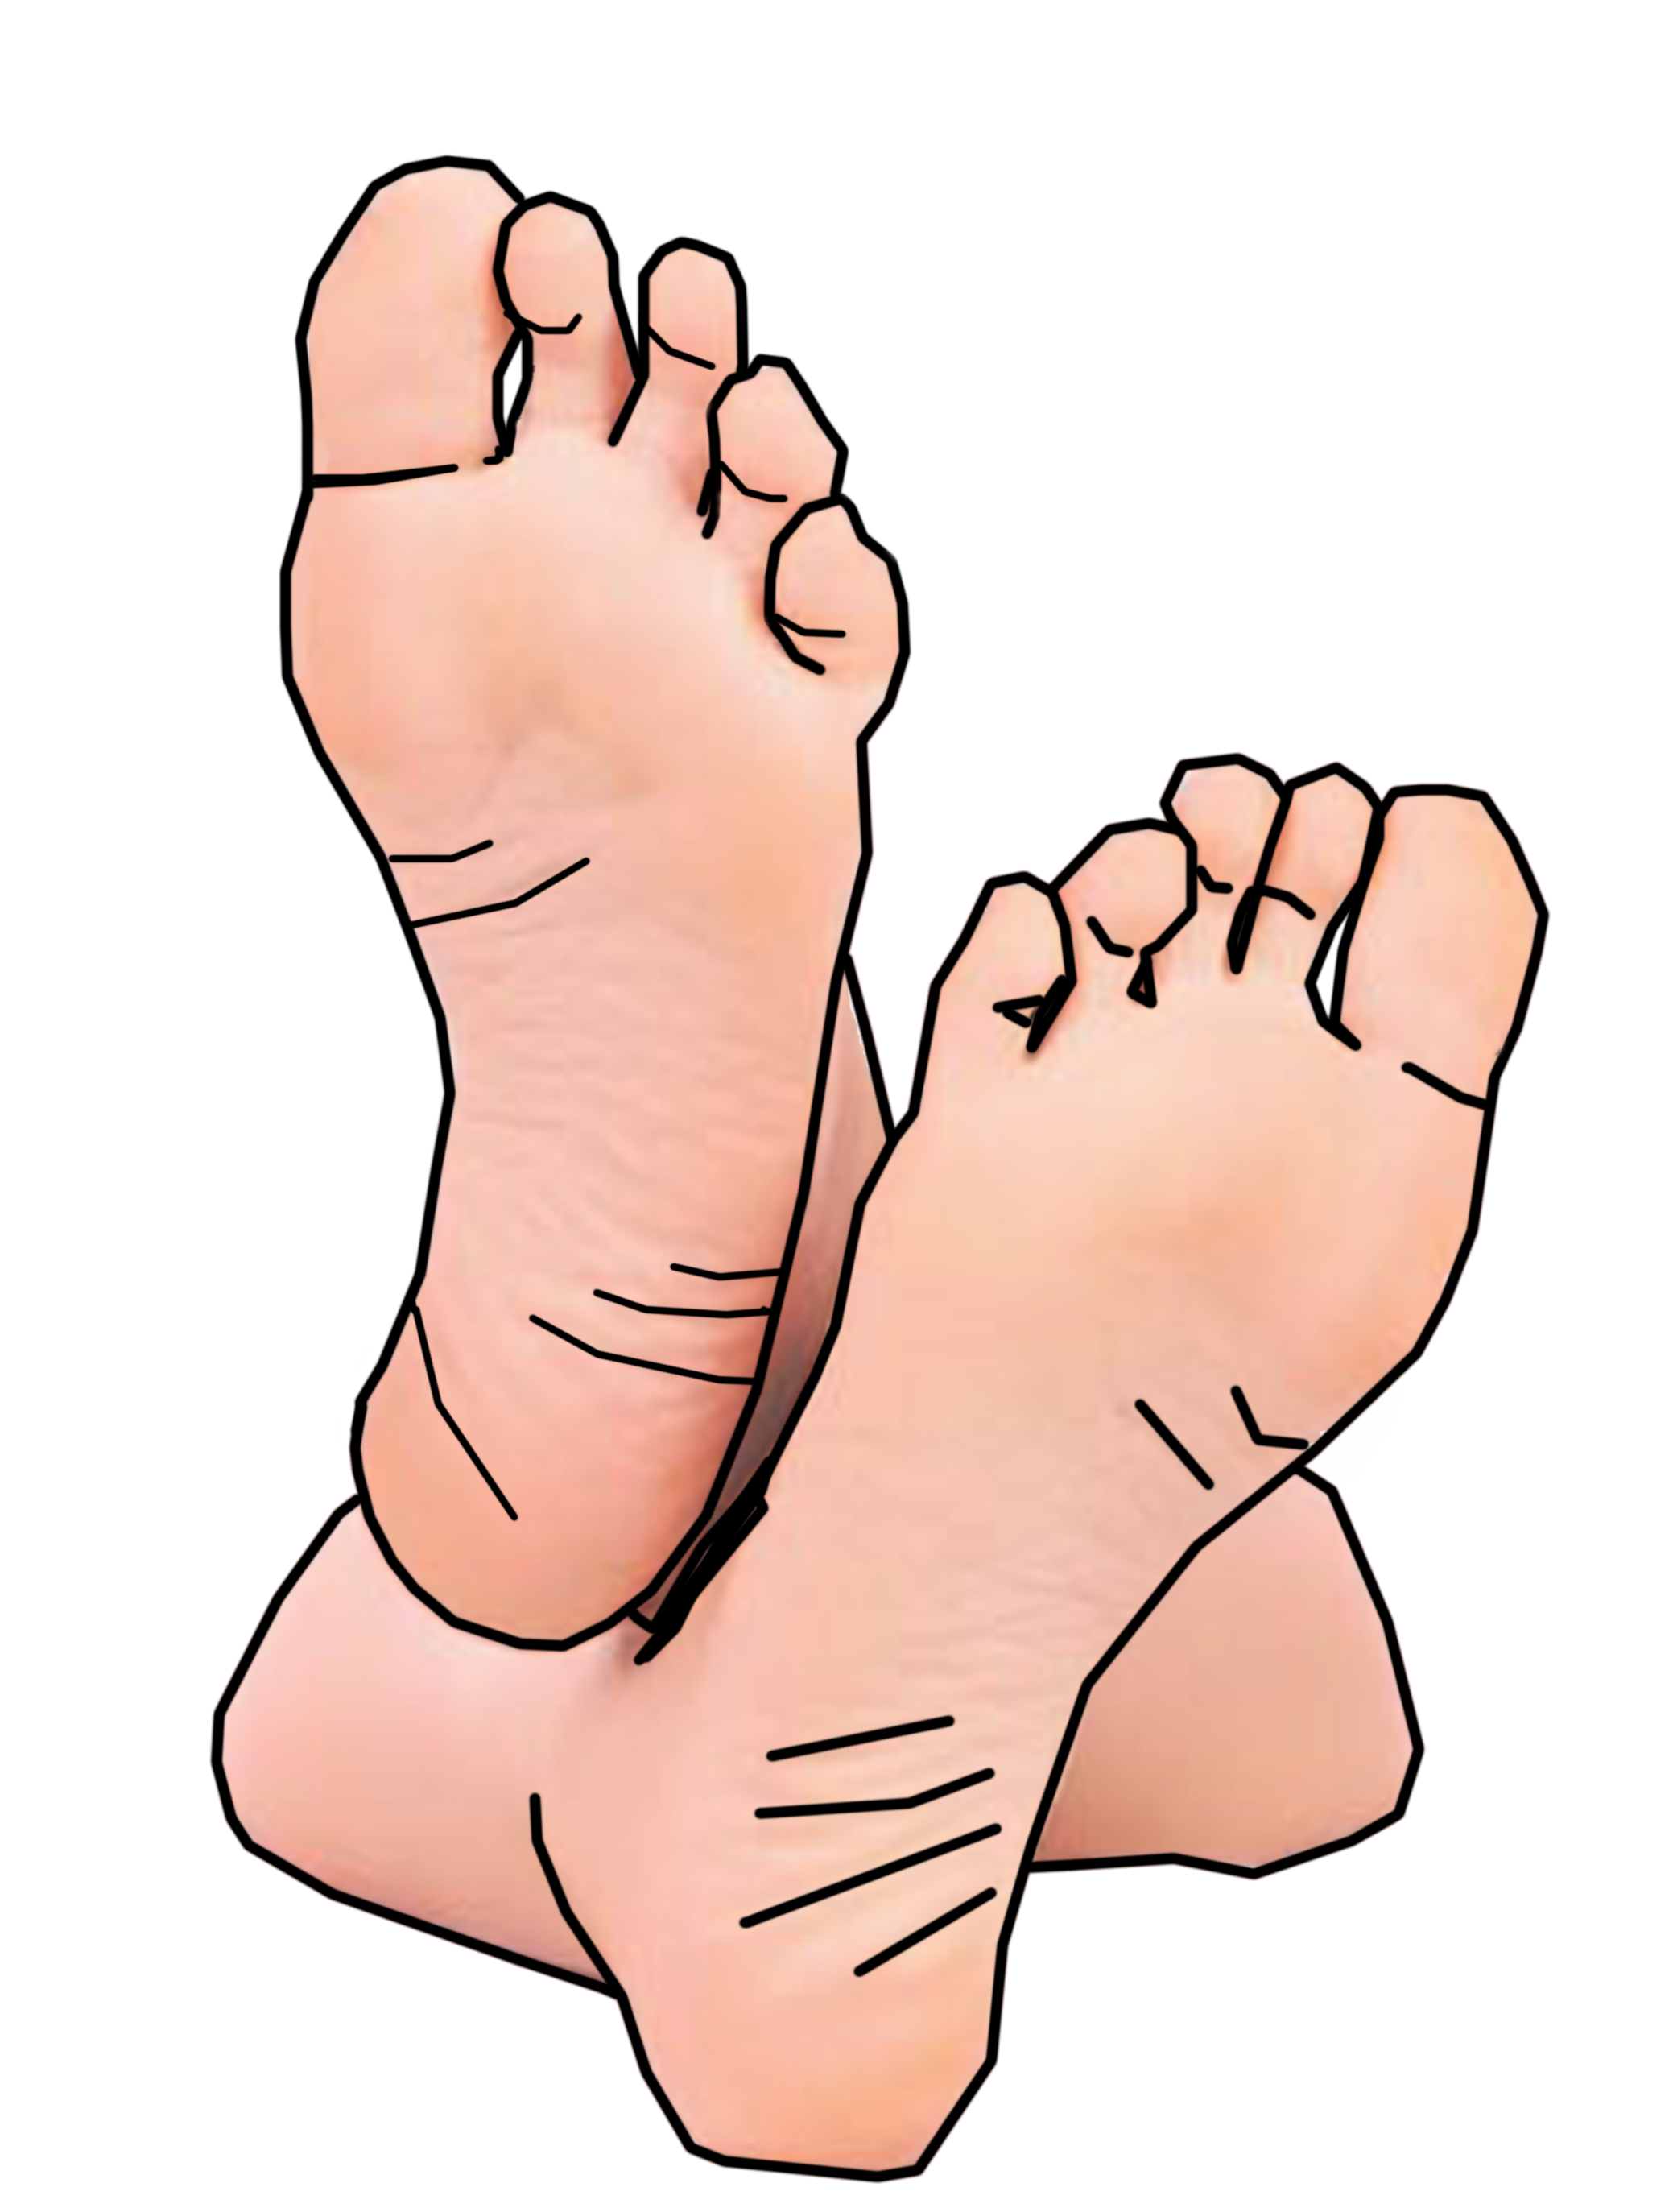 Turkey foot clipart banner royalty free download Bare Feet Clip Art | Feetsies image | Feet | Pinterest | Clip art ... banner royalty free download